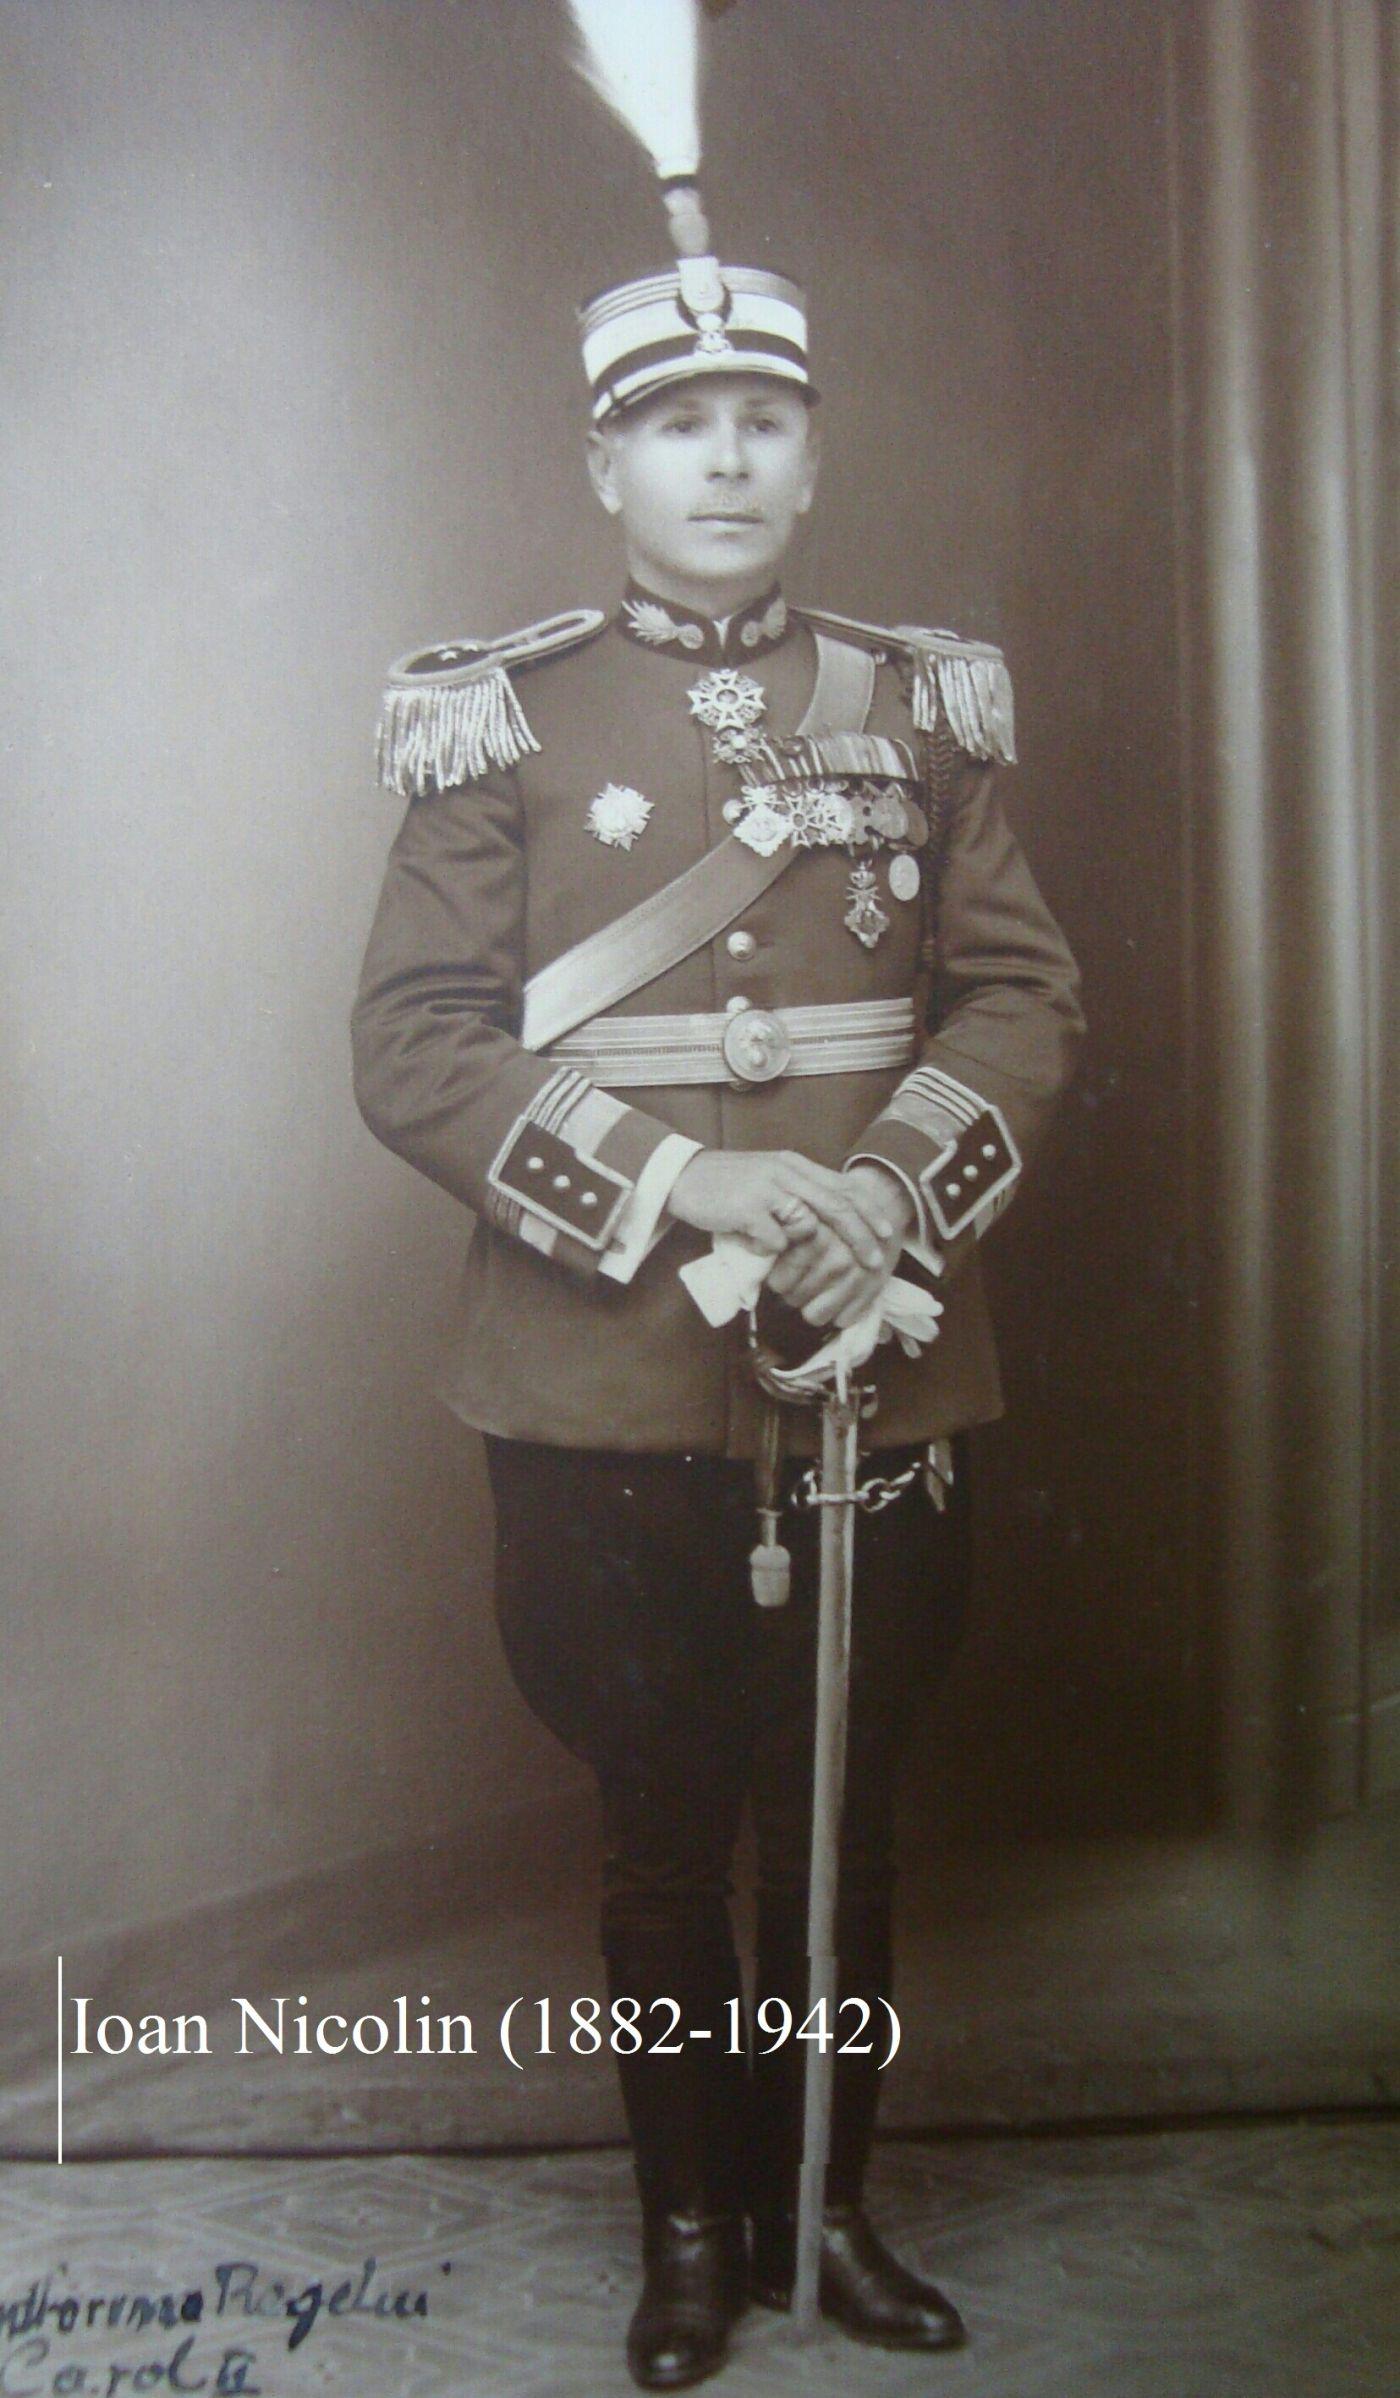 Ioan Nicolin (1882-1942)